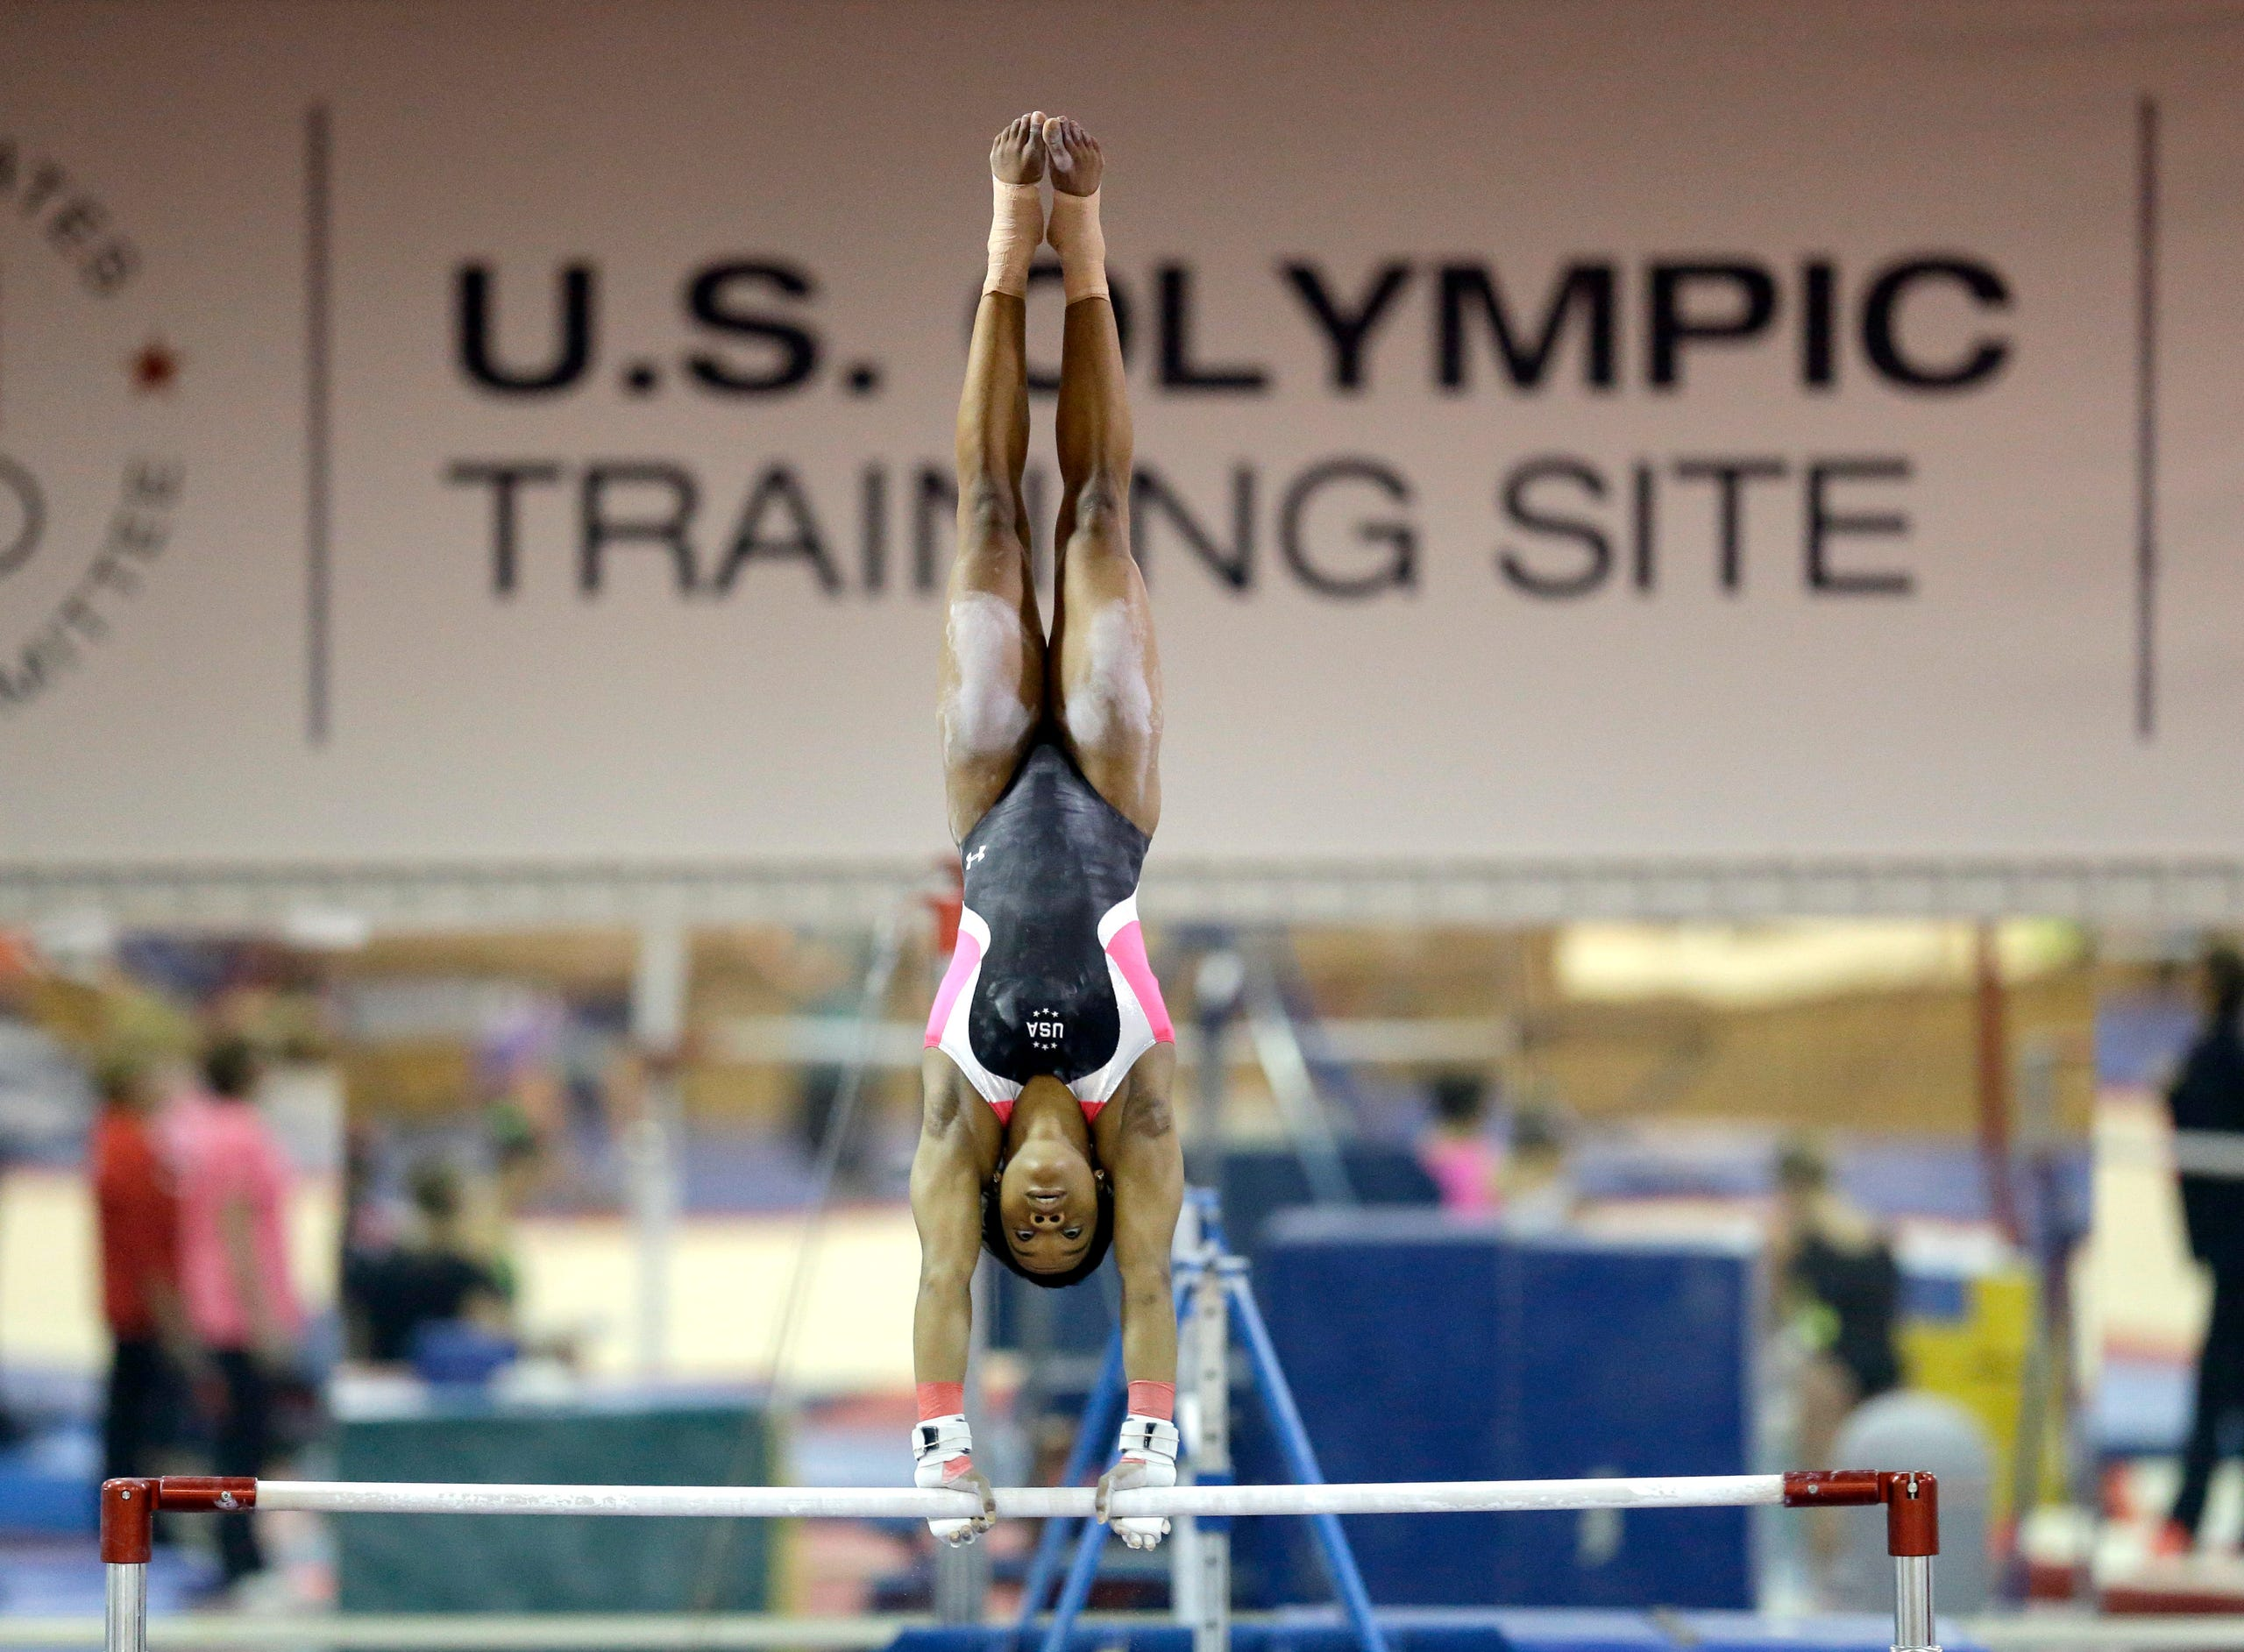 A look at Karolyi Ranch, a gymnastics training facility in Texas